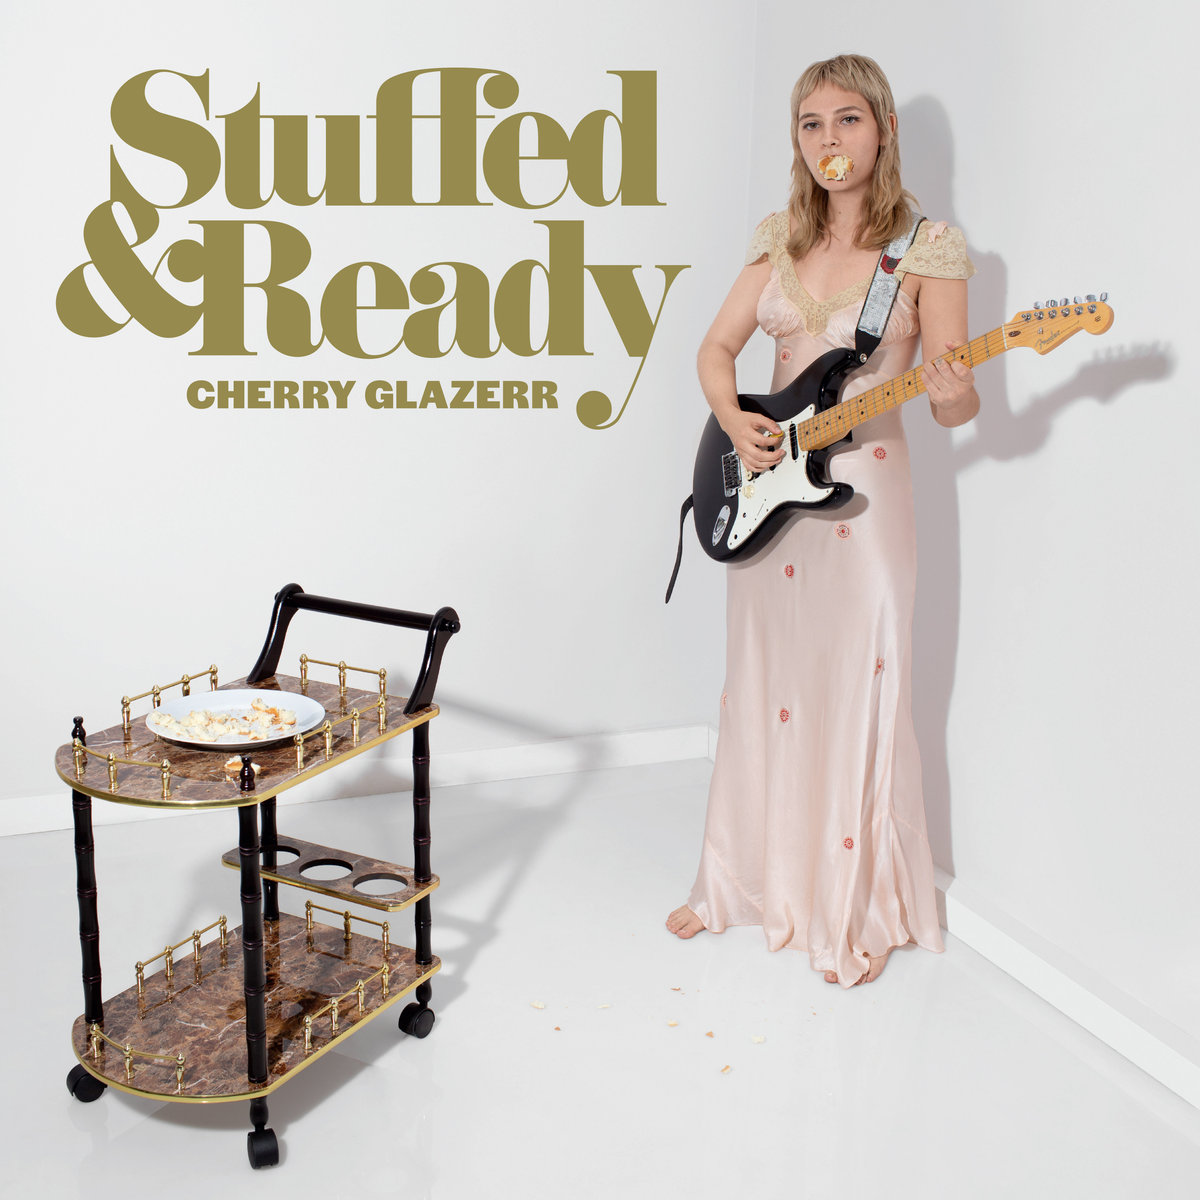 Cherry Glazerr Stuffed and Ready